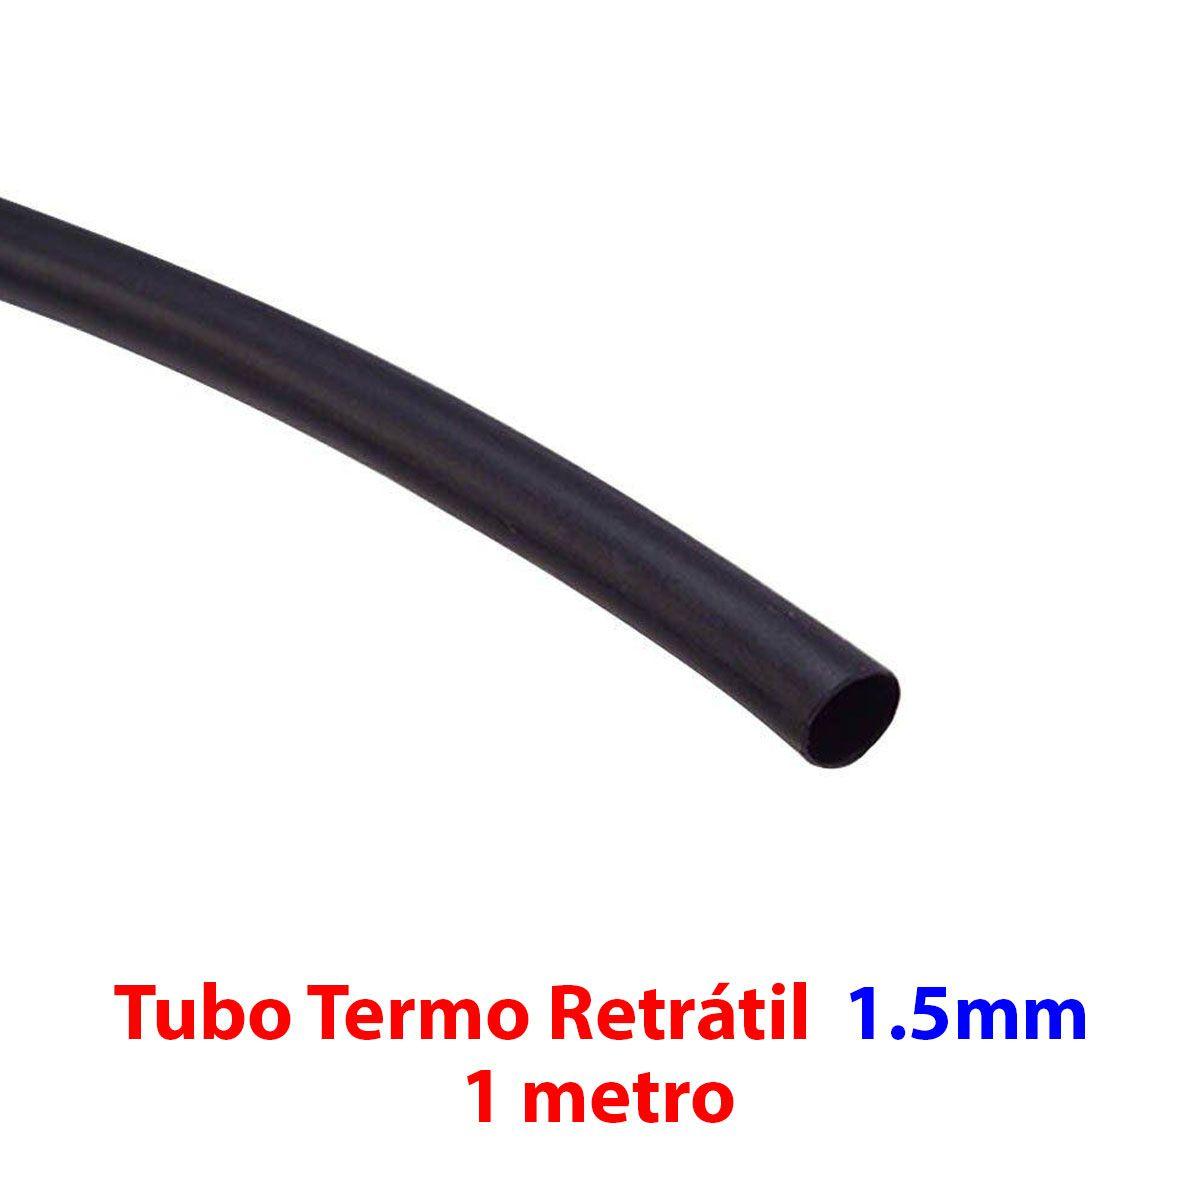 Espaguete Isolante / Tubo Termo Retrátil Espessura 1,5mm | Comprimento 1 Metro